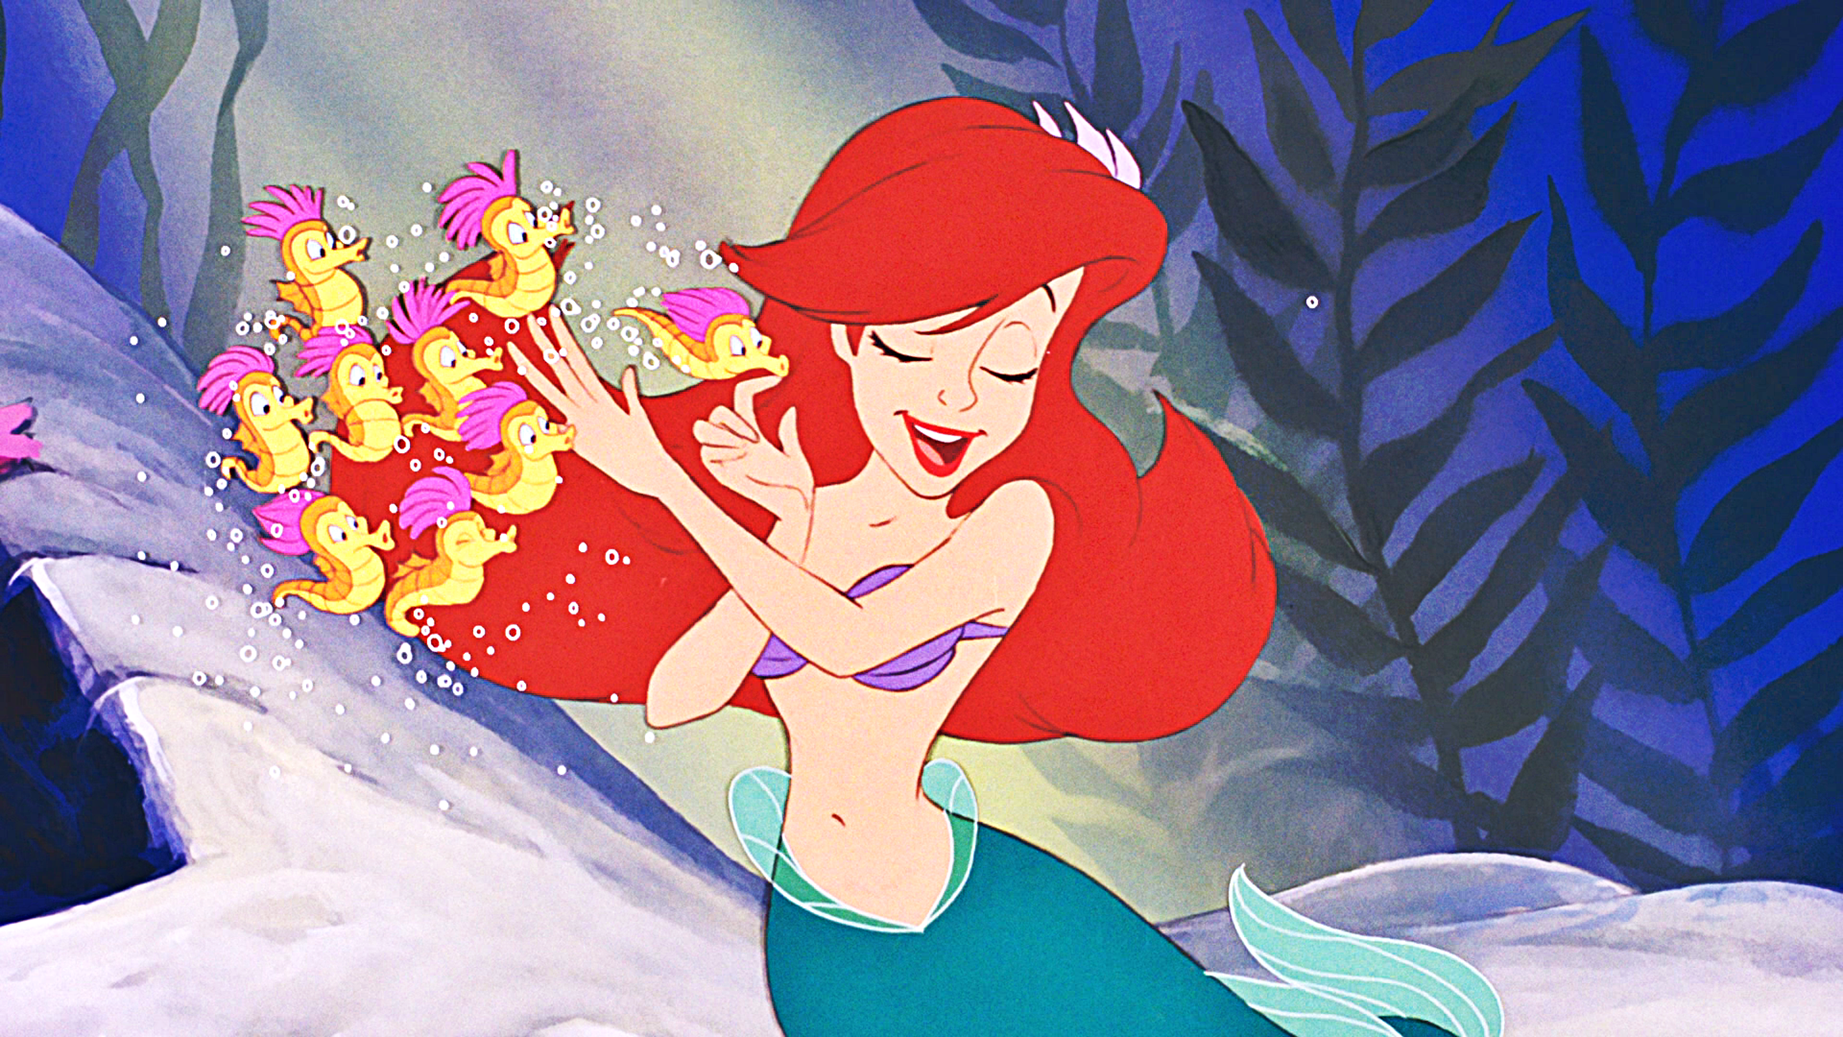 Walt Disney Screencaps - Princess Ariel